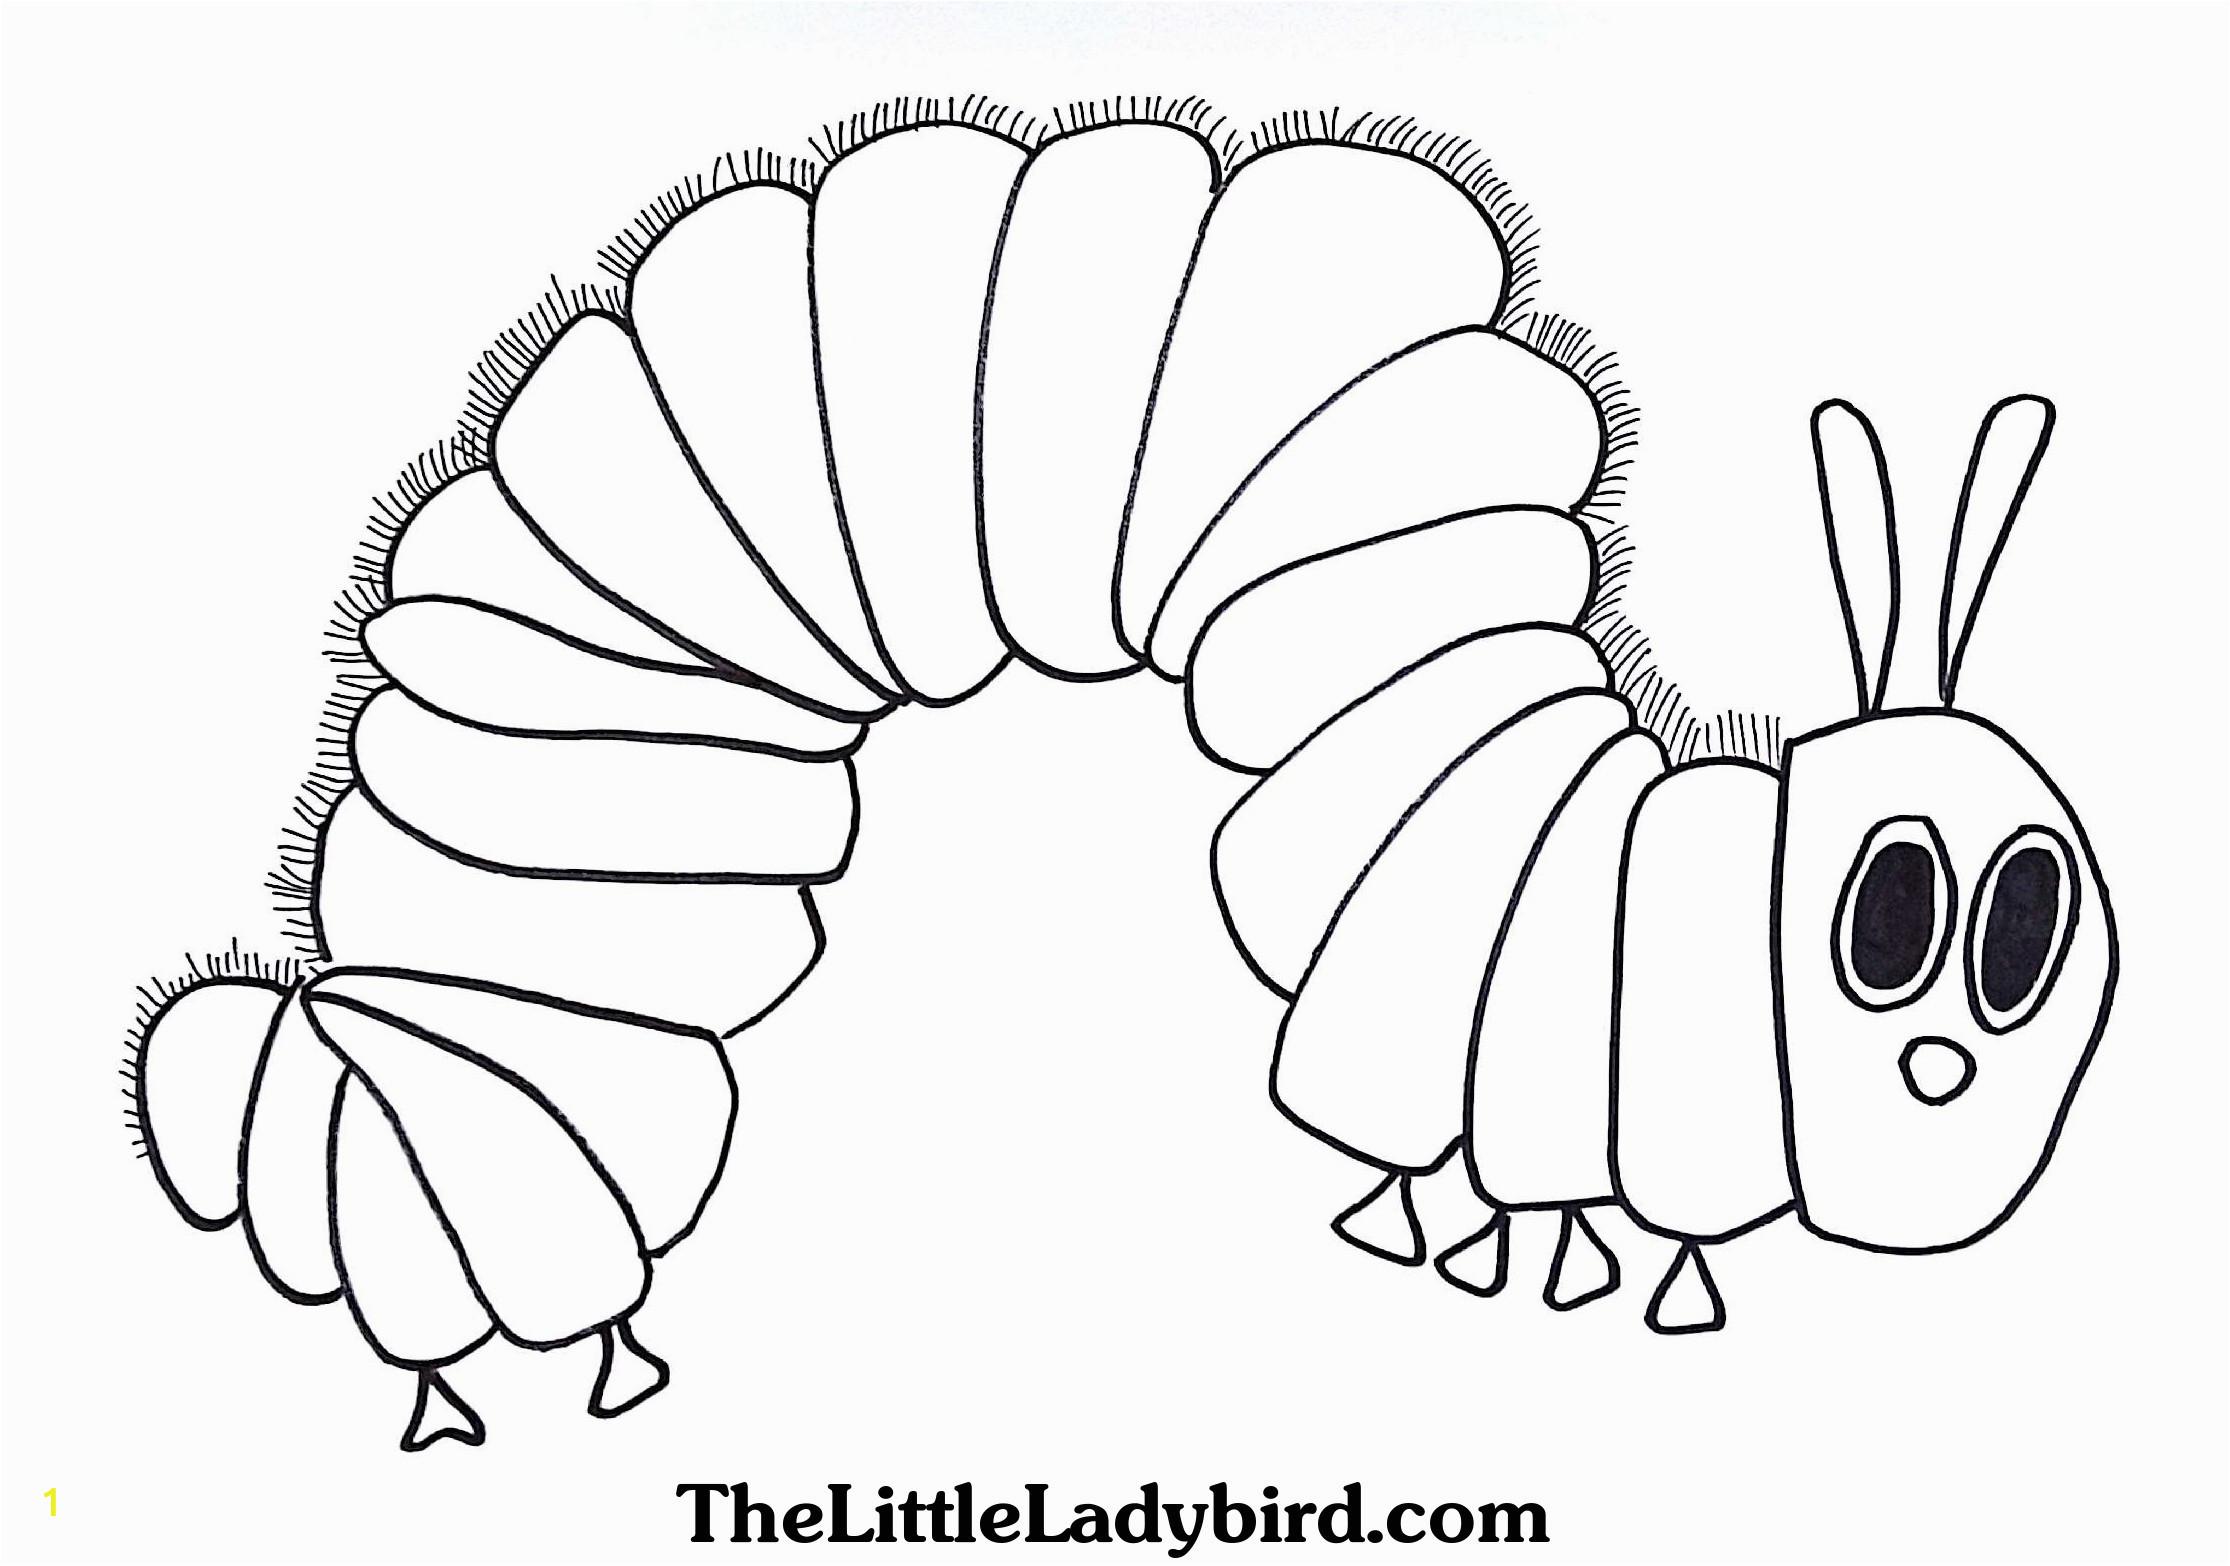 hungry caterpillar drawing